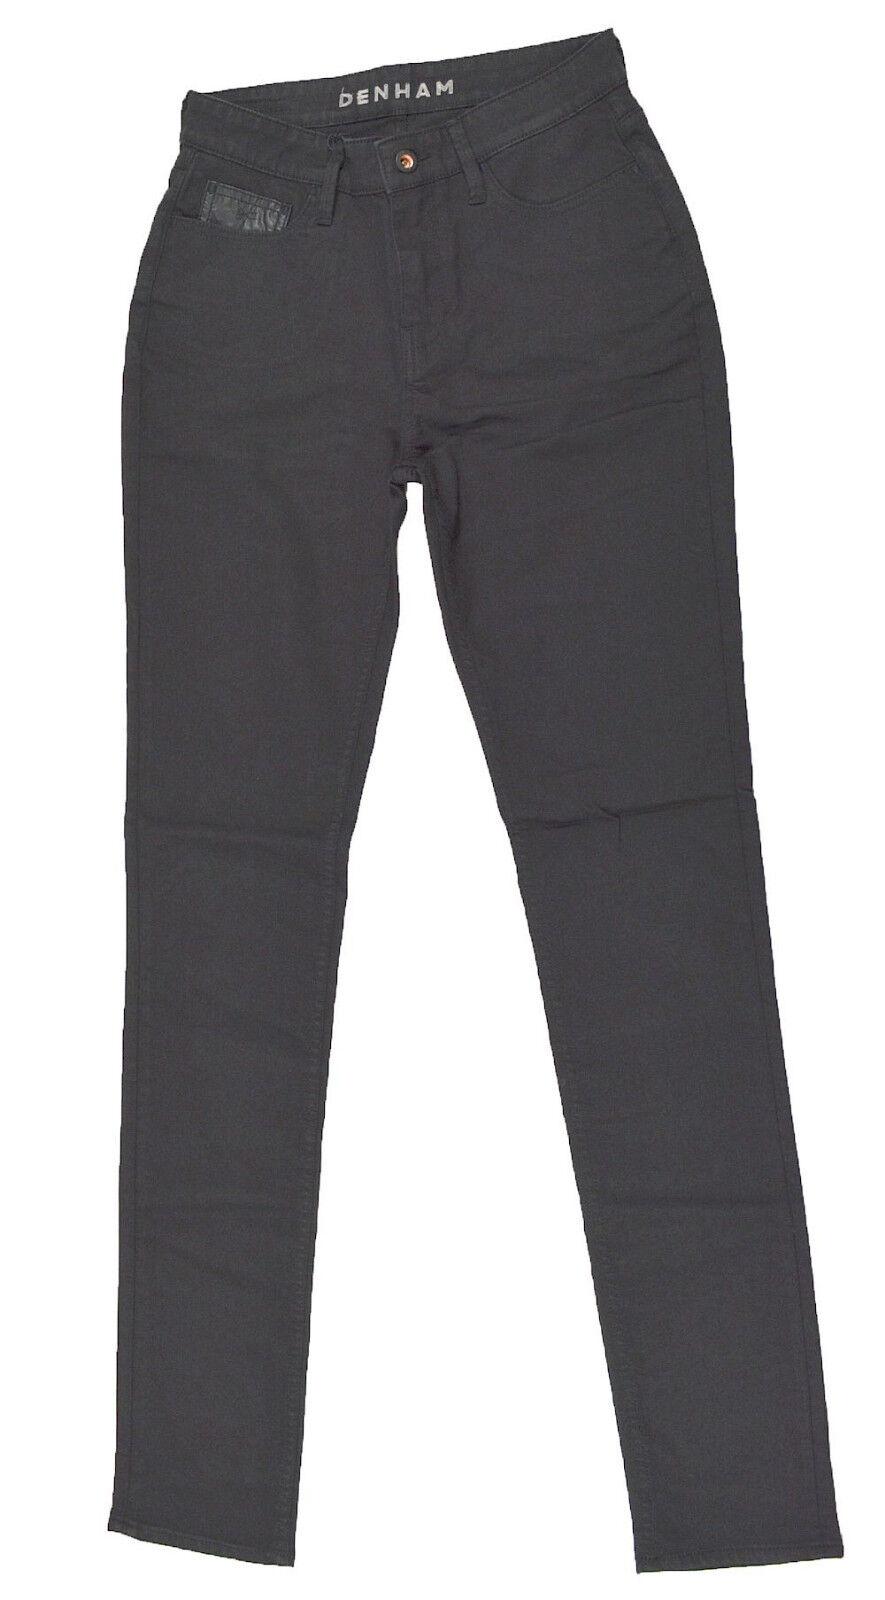 Denham Marianne SCR High Skinny Fit Damen Jeans Hose jeans hosen sale 1-217